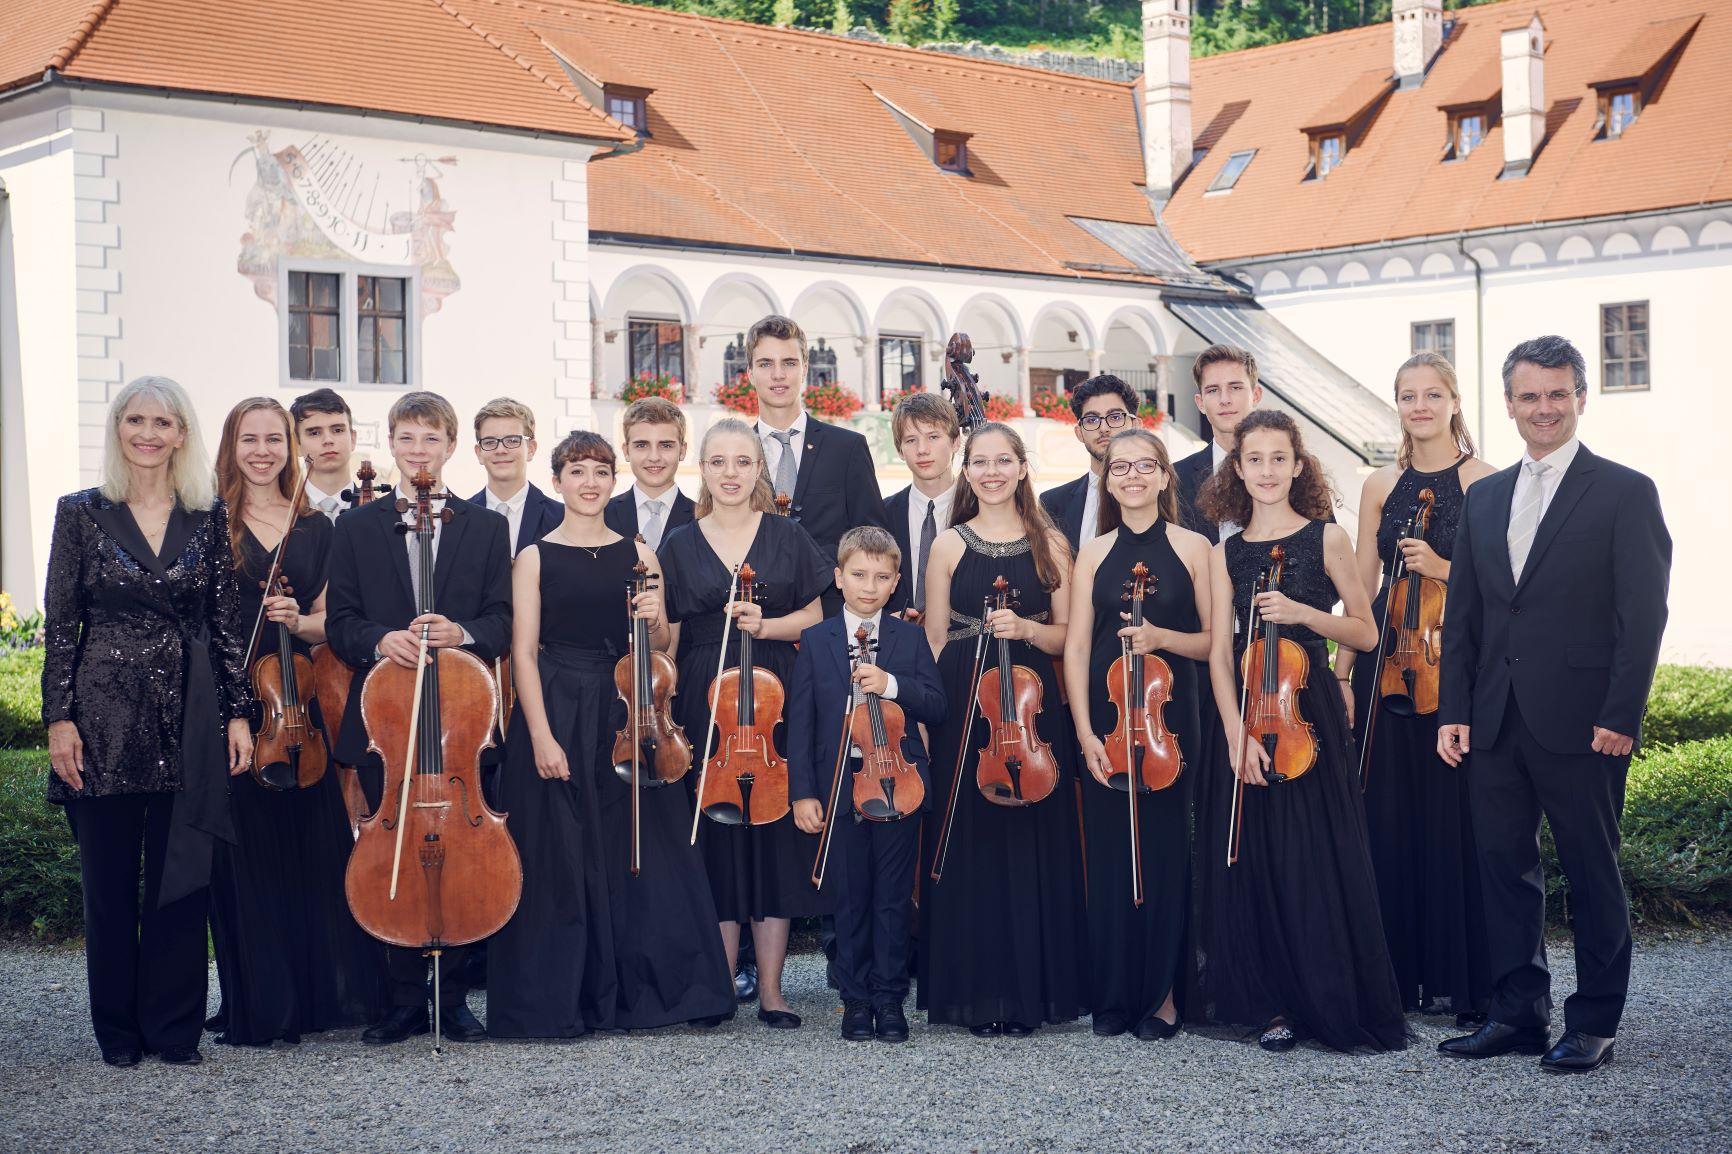 Kooperation mit Wiener Philharmonikern 2020